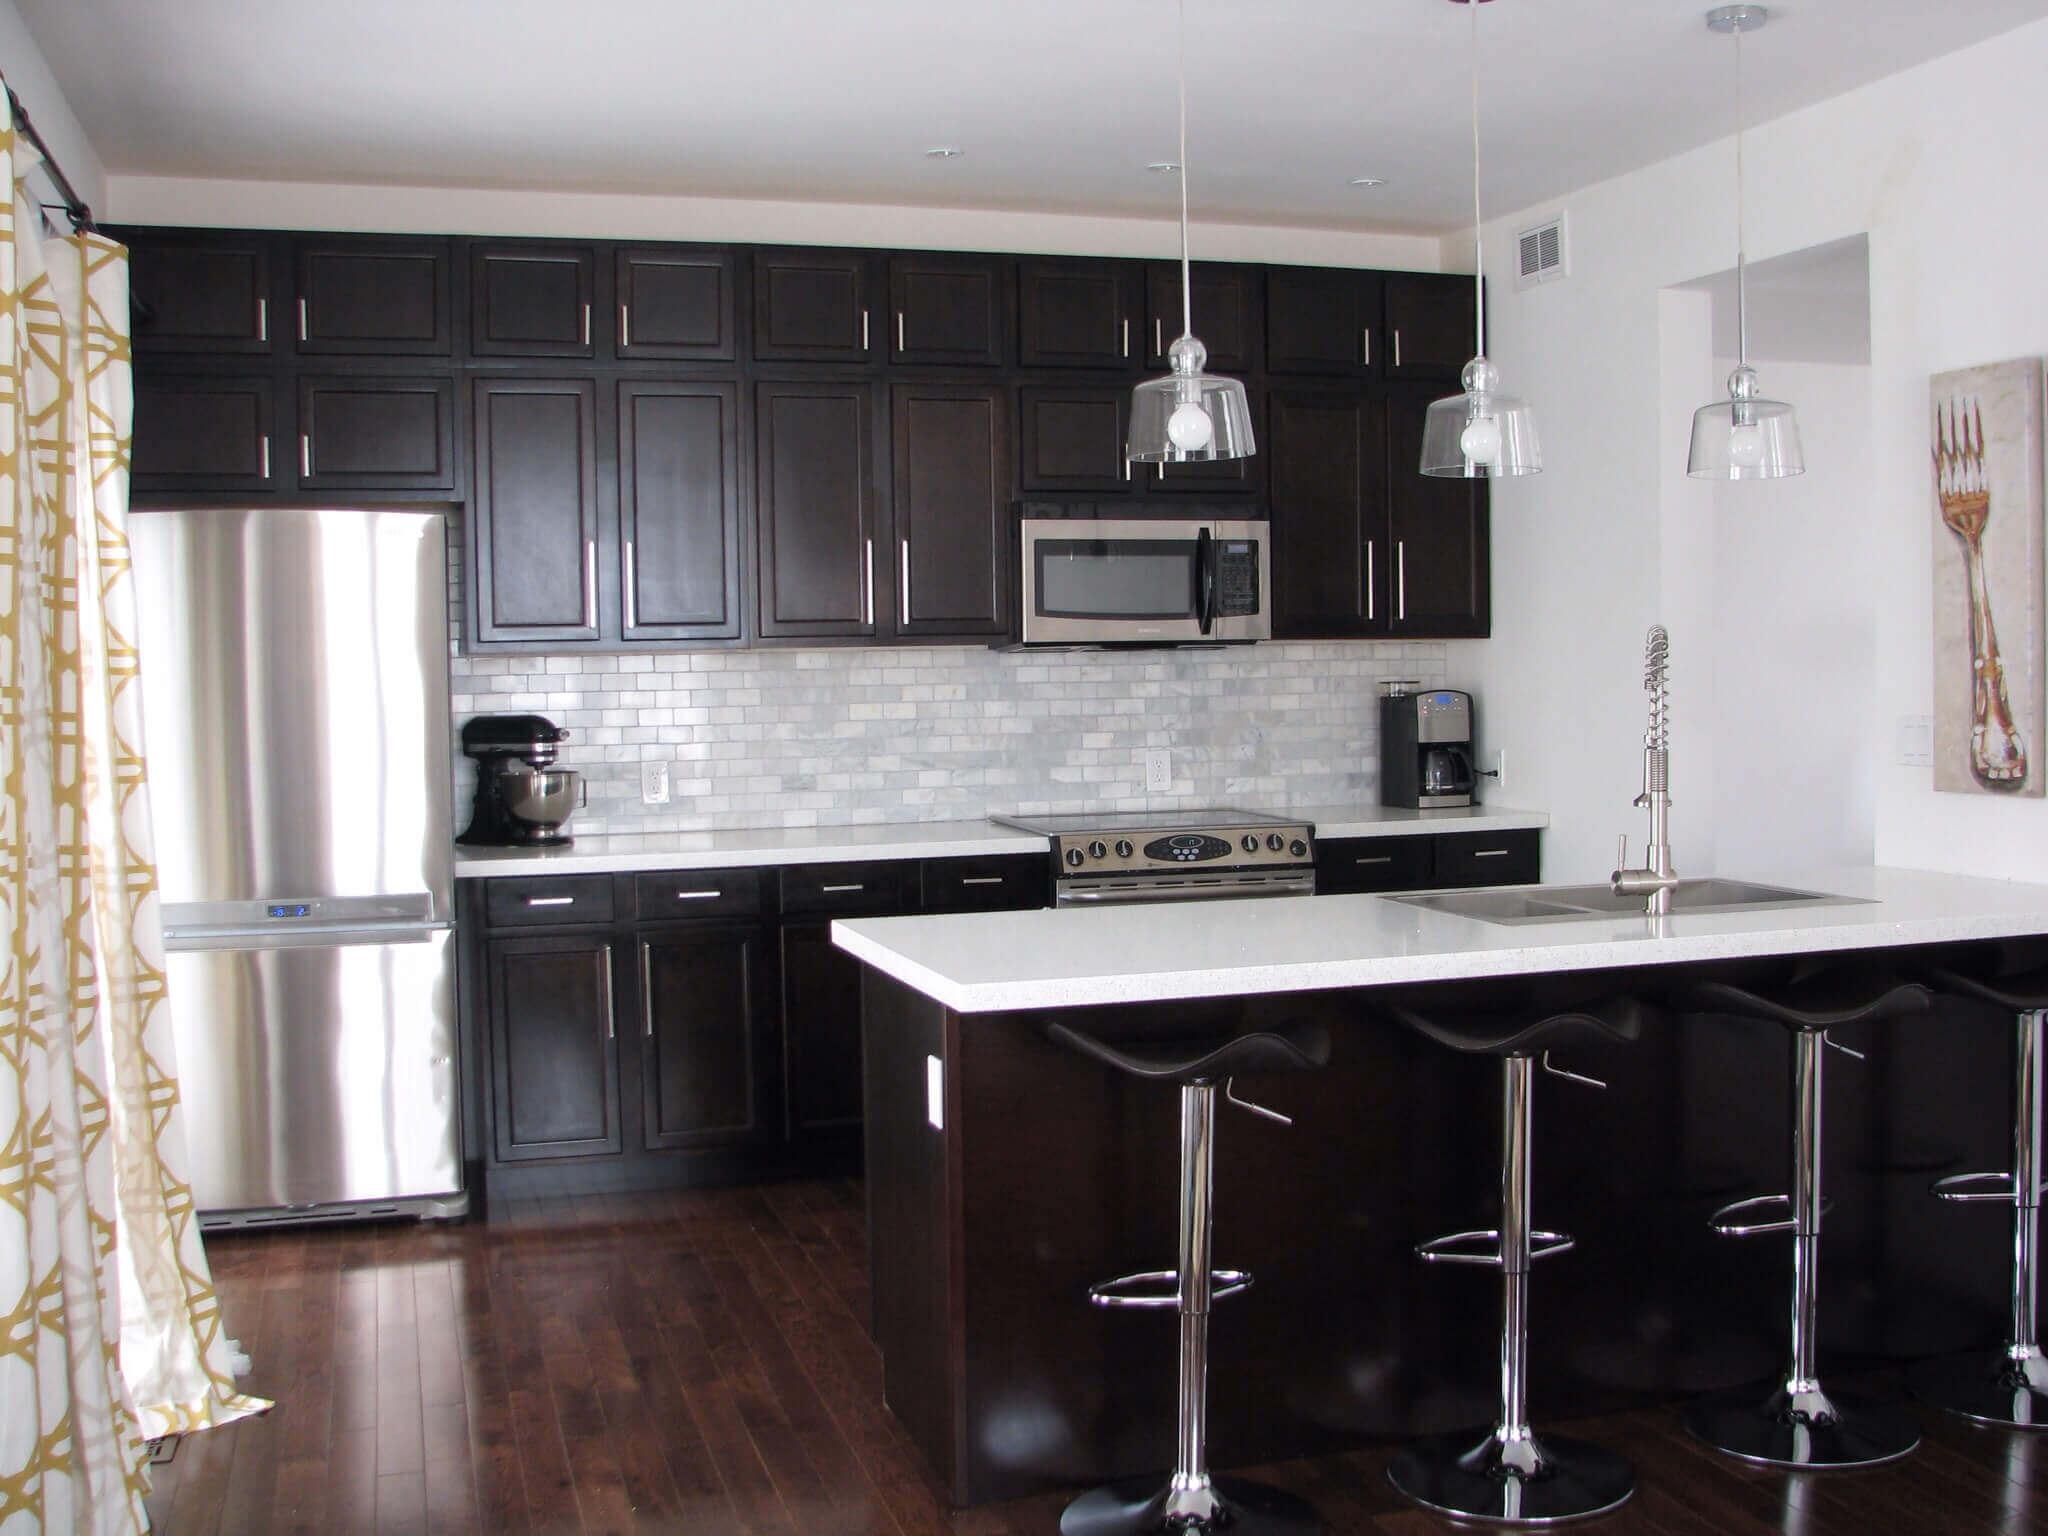 78+ Great Looking Modern Kitchen Gallery   Sinks, Islands ... on Modern Kitchen Counter  id=92198